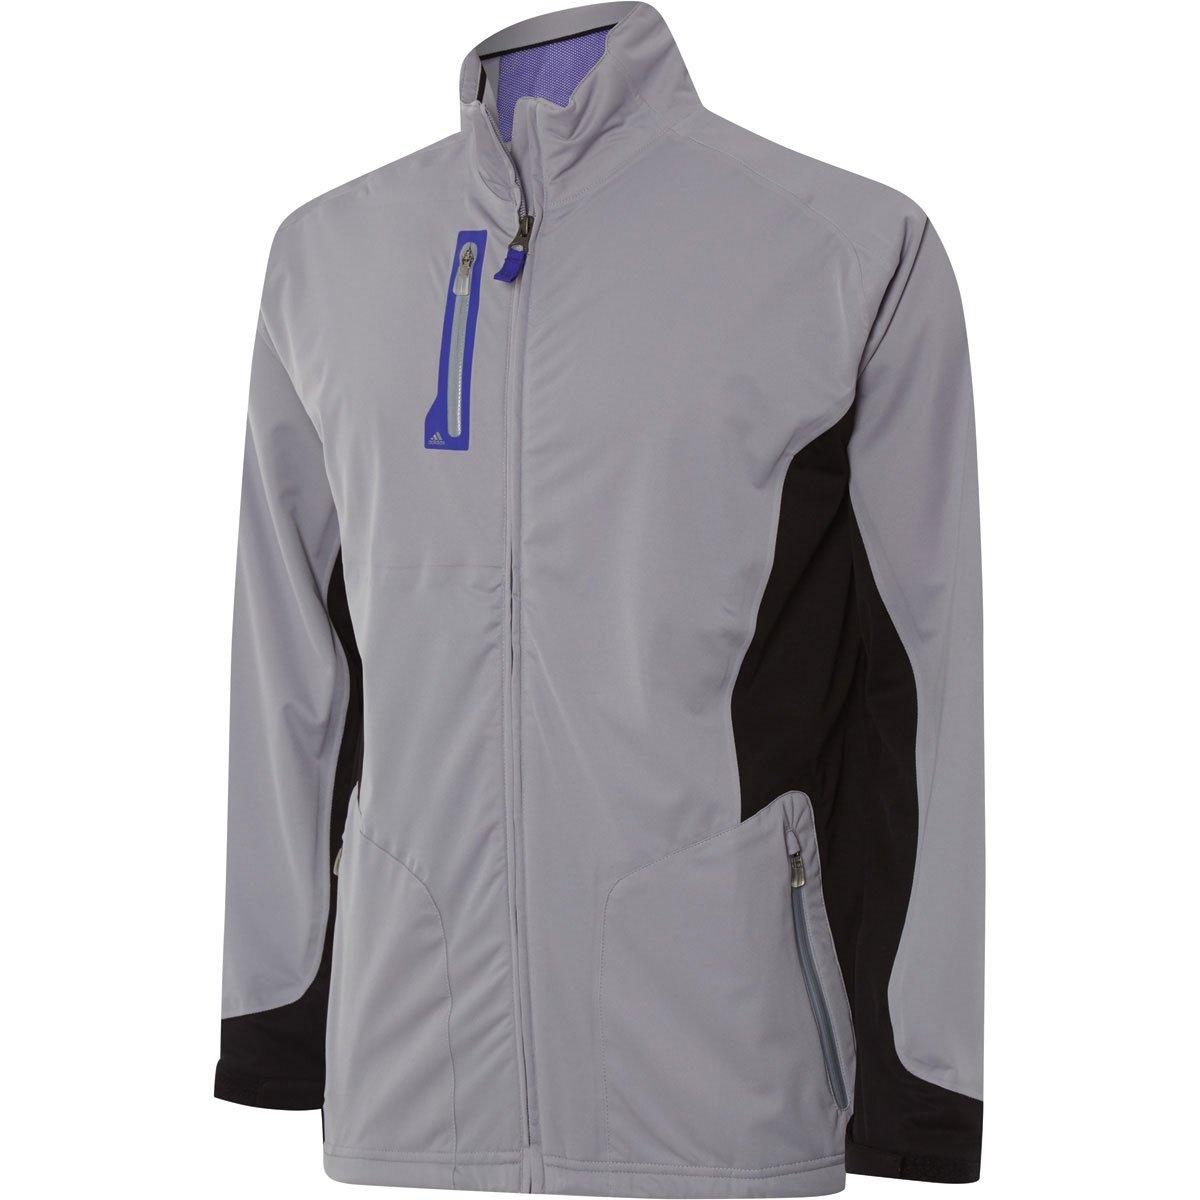 28e793140e4eb adidas 2015 Climaproof Advance Rain Full Zip Waterproof Mens Golf Jacket